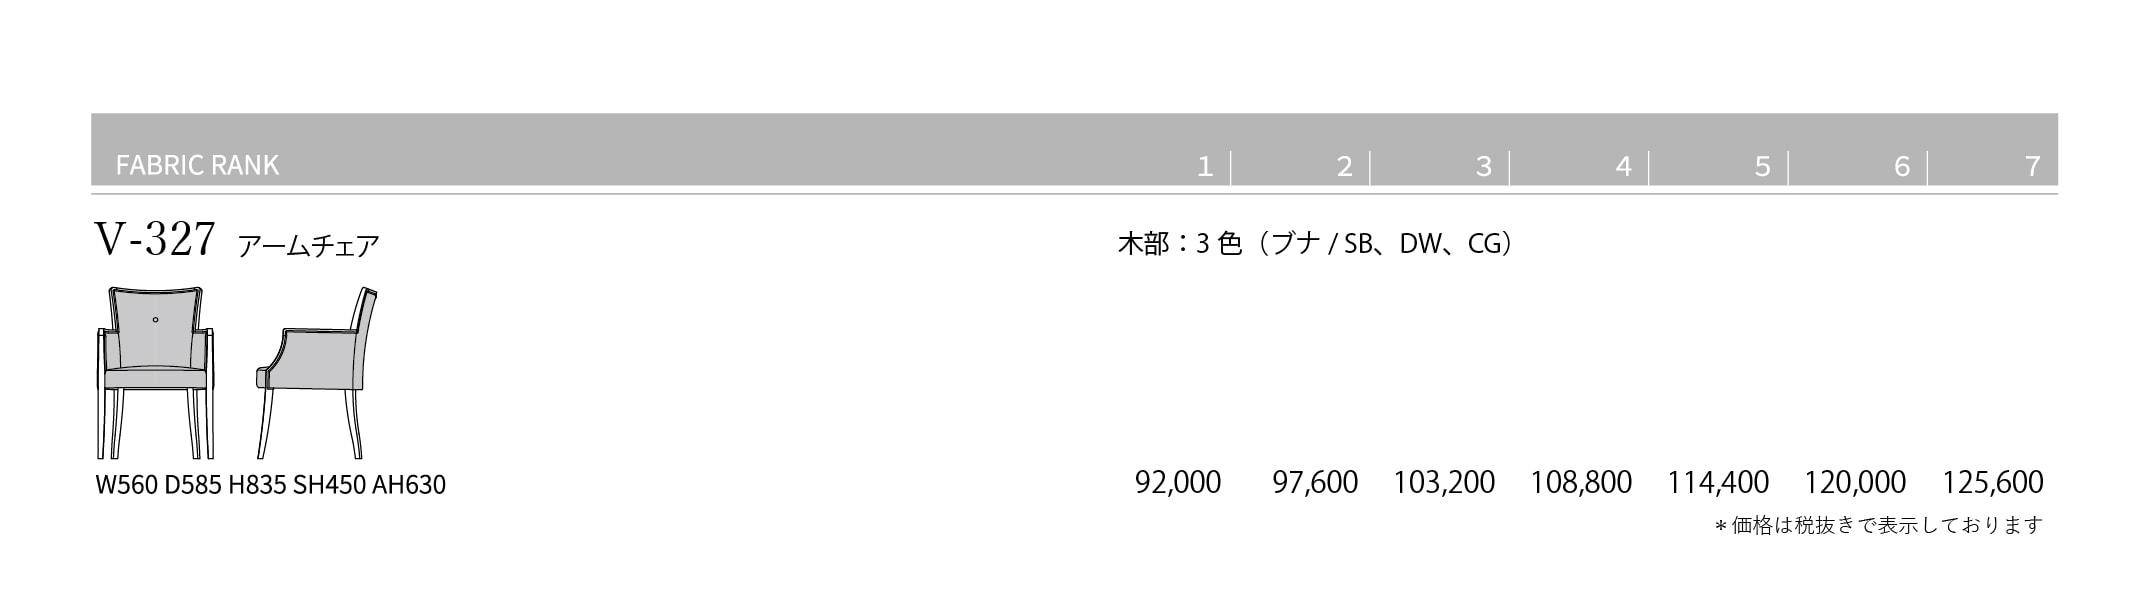 V-327 Price List